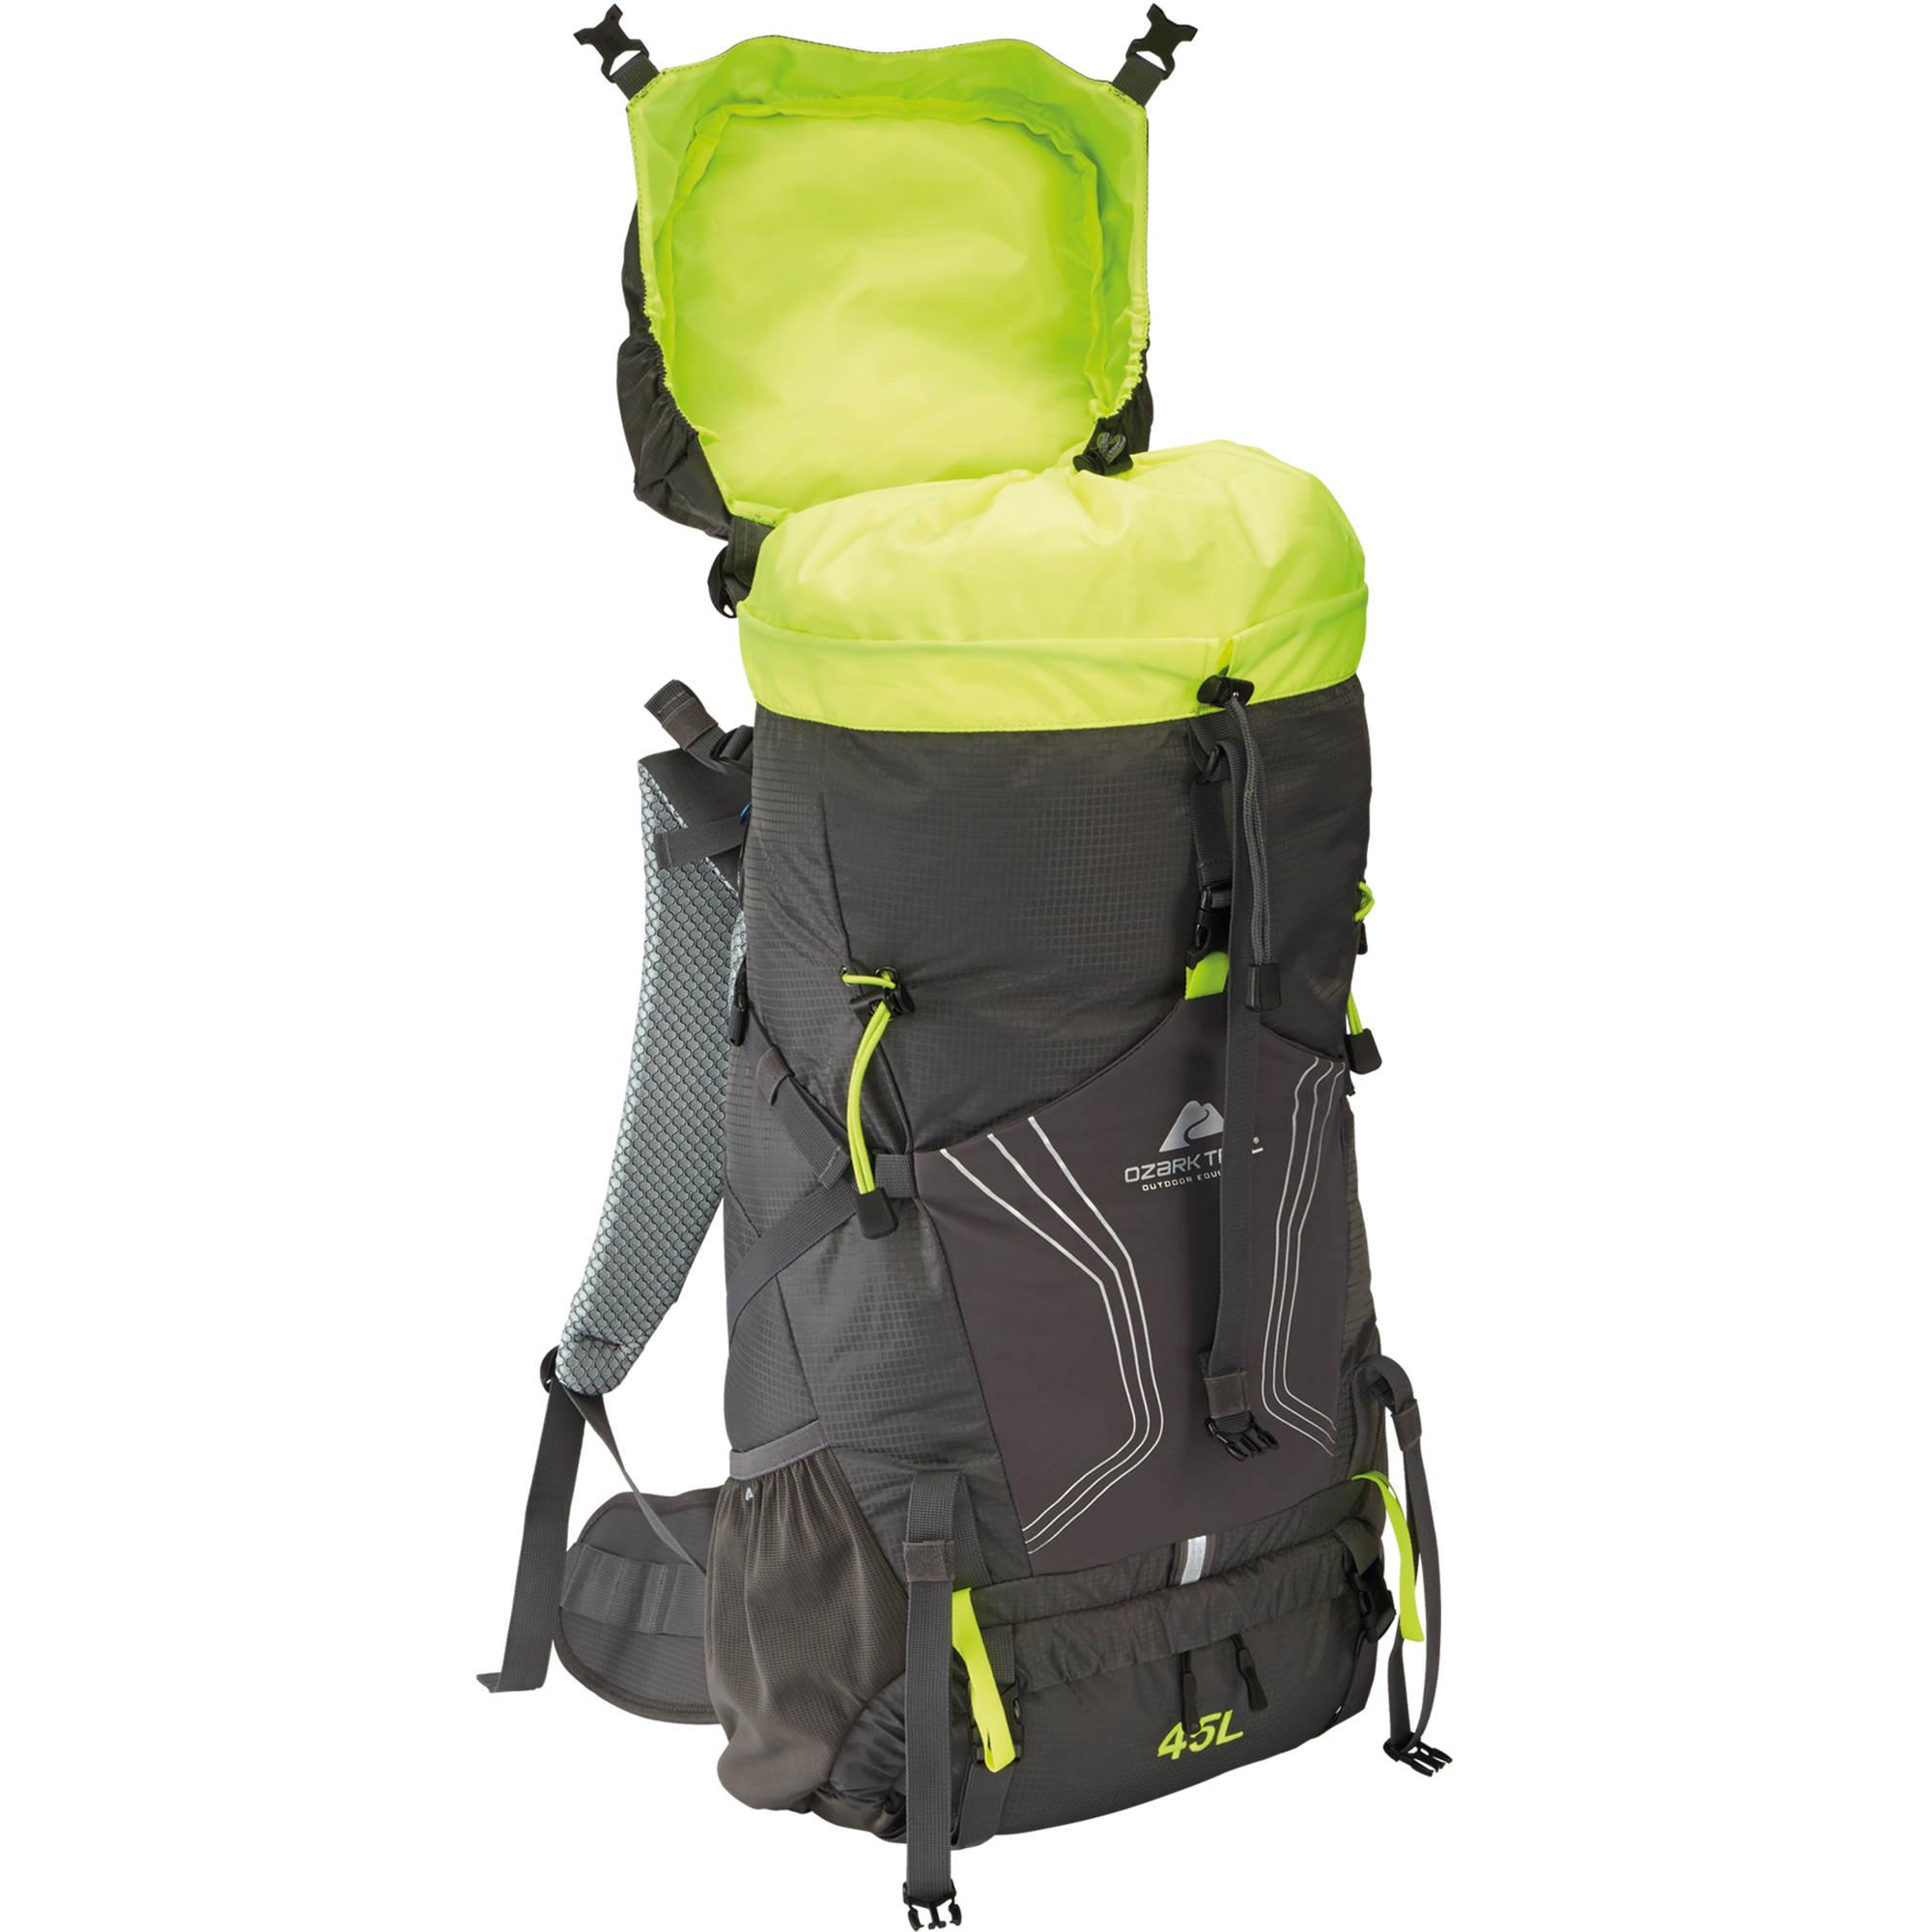 d957c451d3 Ozark Trail Bags on Clearance   Walmart (YMMV) - Slickdeals.net